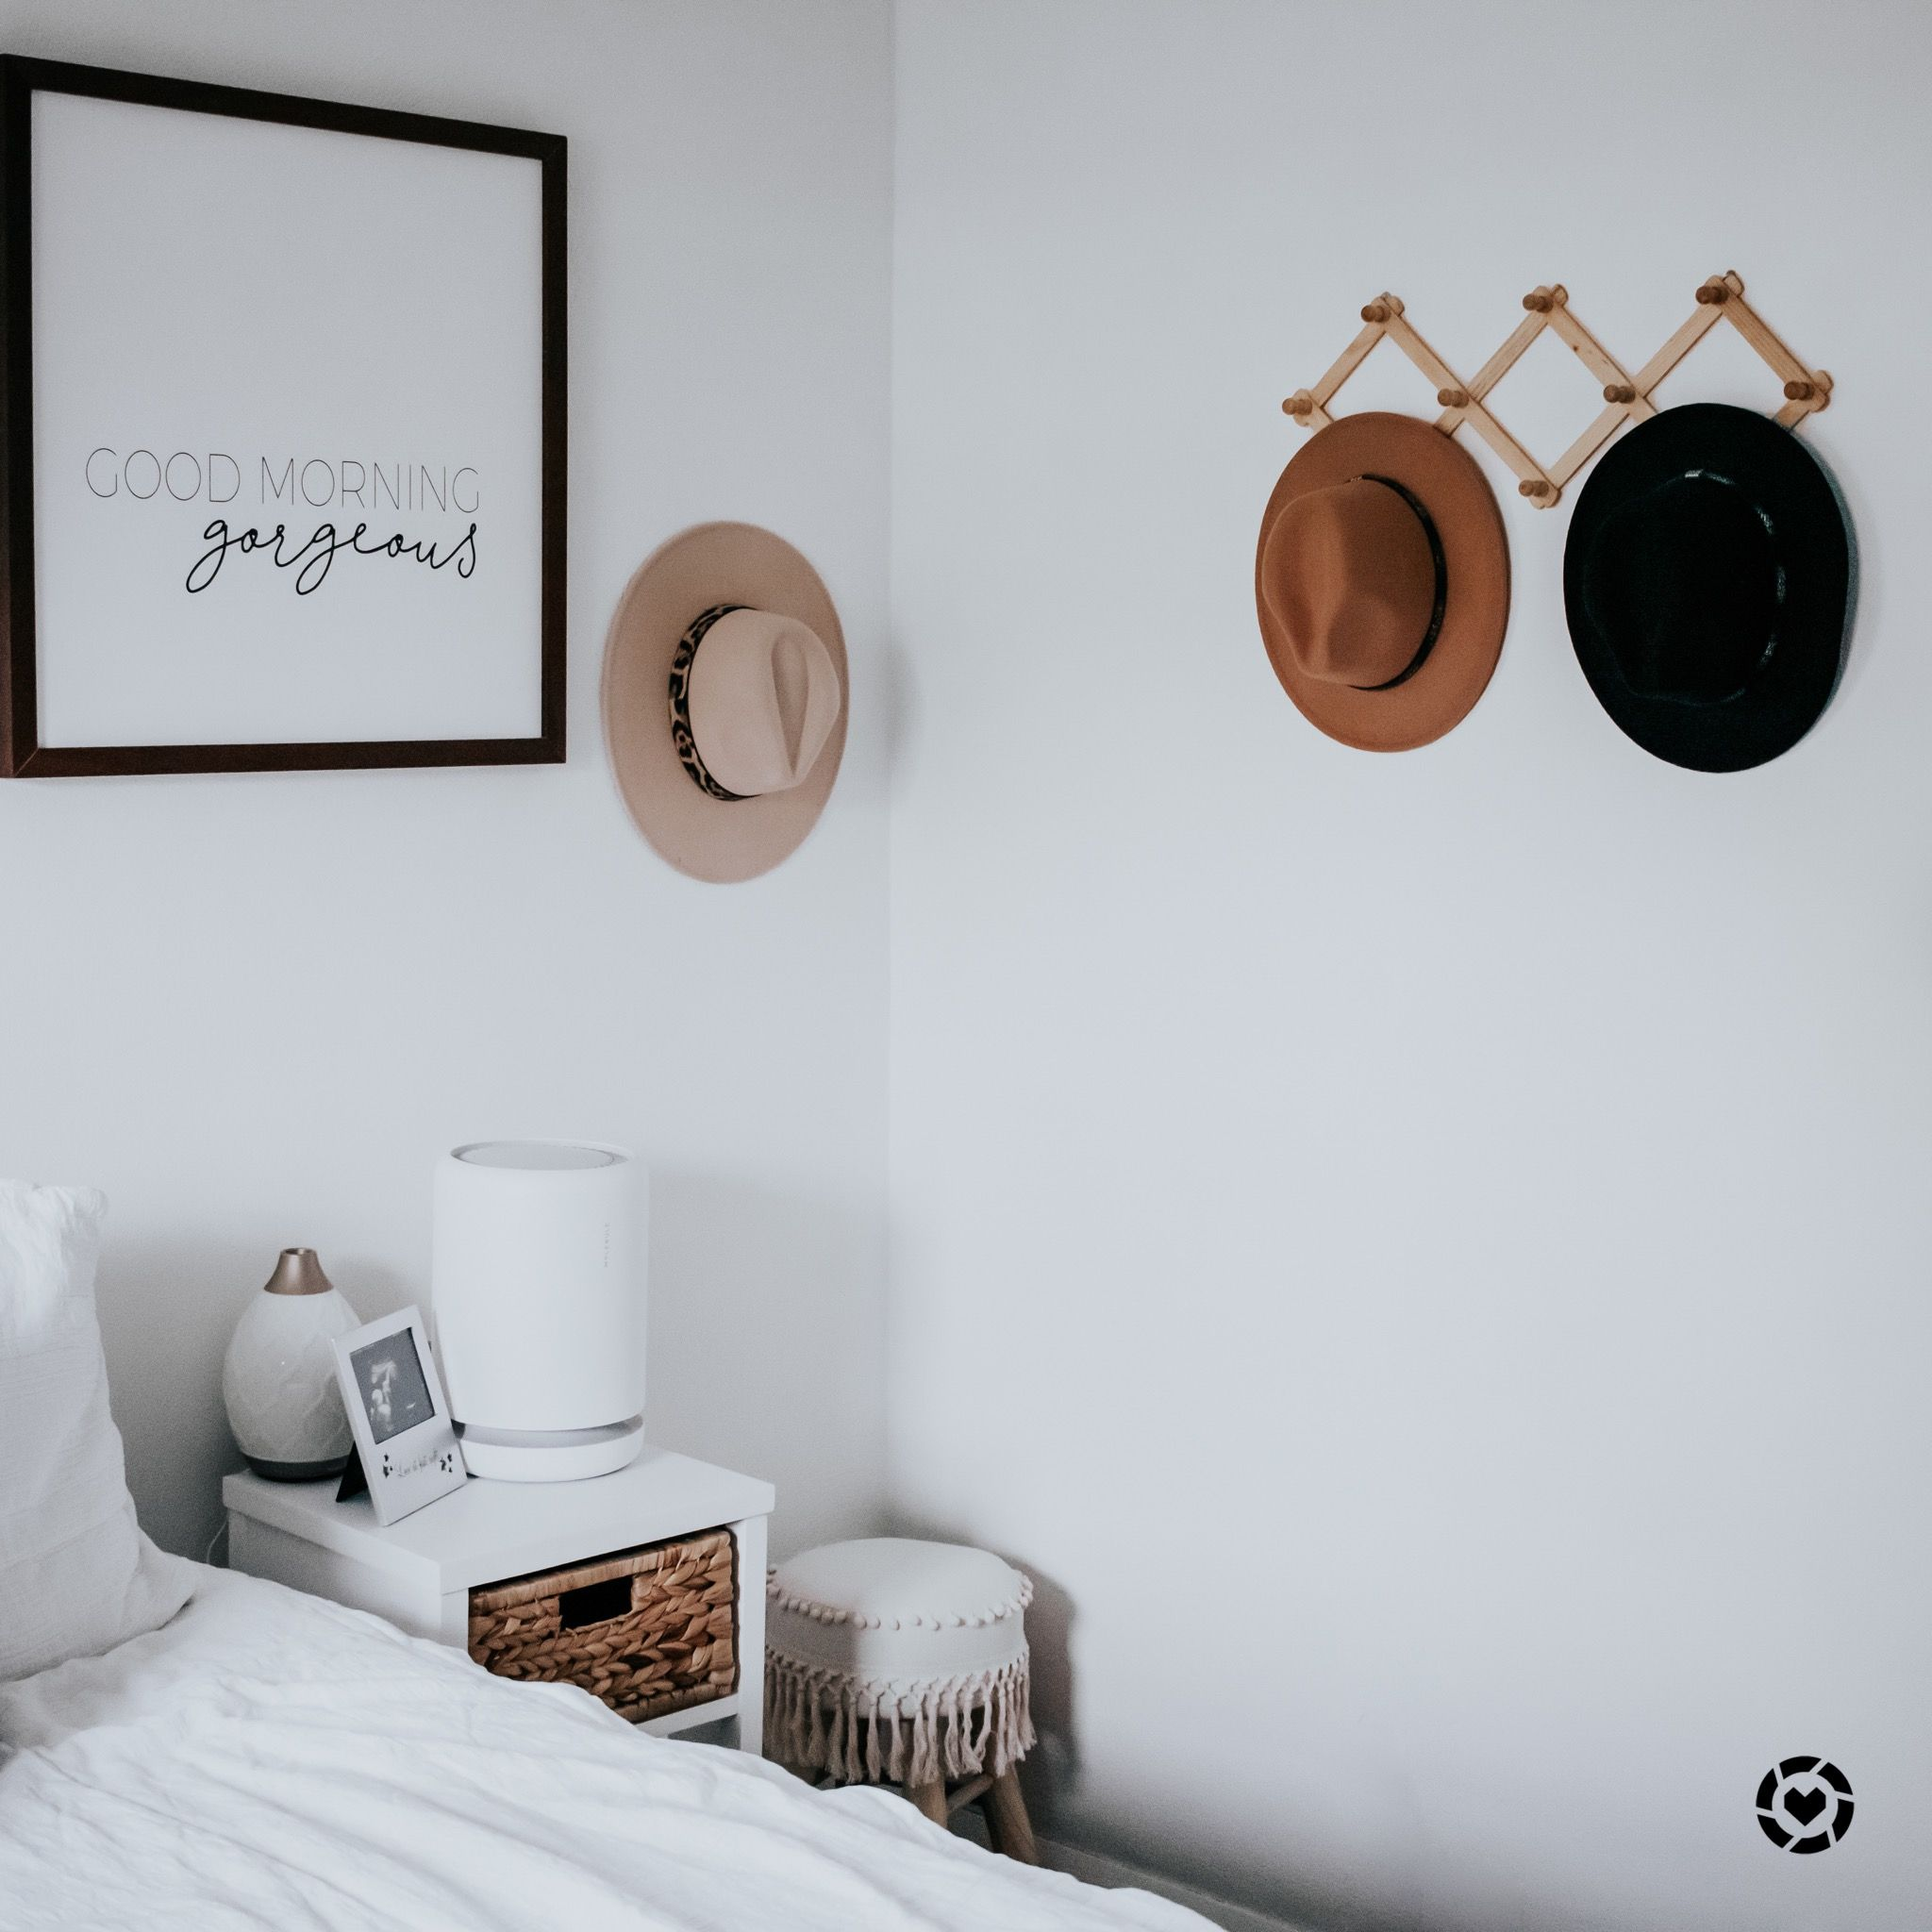 Screenshot this pic to get shoppable product details with the LIKEtoKNOW.it shopping app  #mymolekule #molekule #molekuleair #airpurifier #bedroomessentials #lifestyleblogger #motherhoodblogger #toddlermom #mommyvlogger #familyblogger #homeinspo #bedroominspo #LTKhome #LTKfamily #LTKblogger #liketkit @liketoknow.it.family @liketoknow.it.home #LTKsalealert  #StayHomeWithLTK #LTKspring #LTKunder50